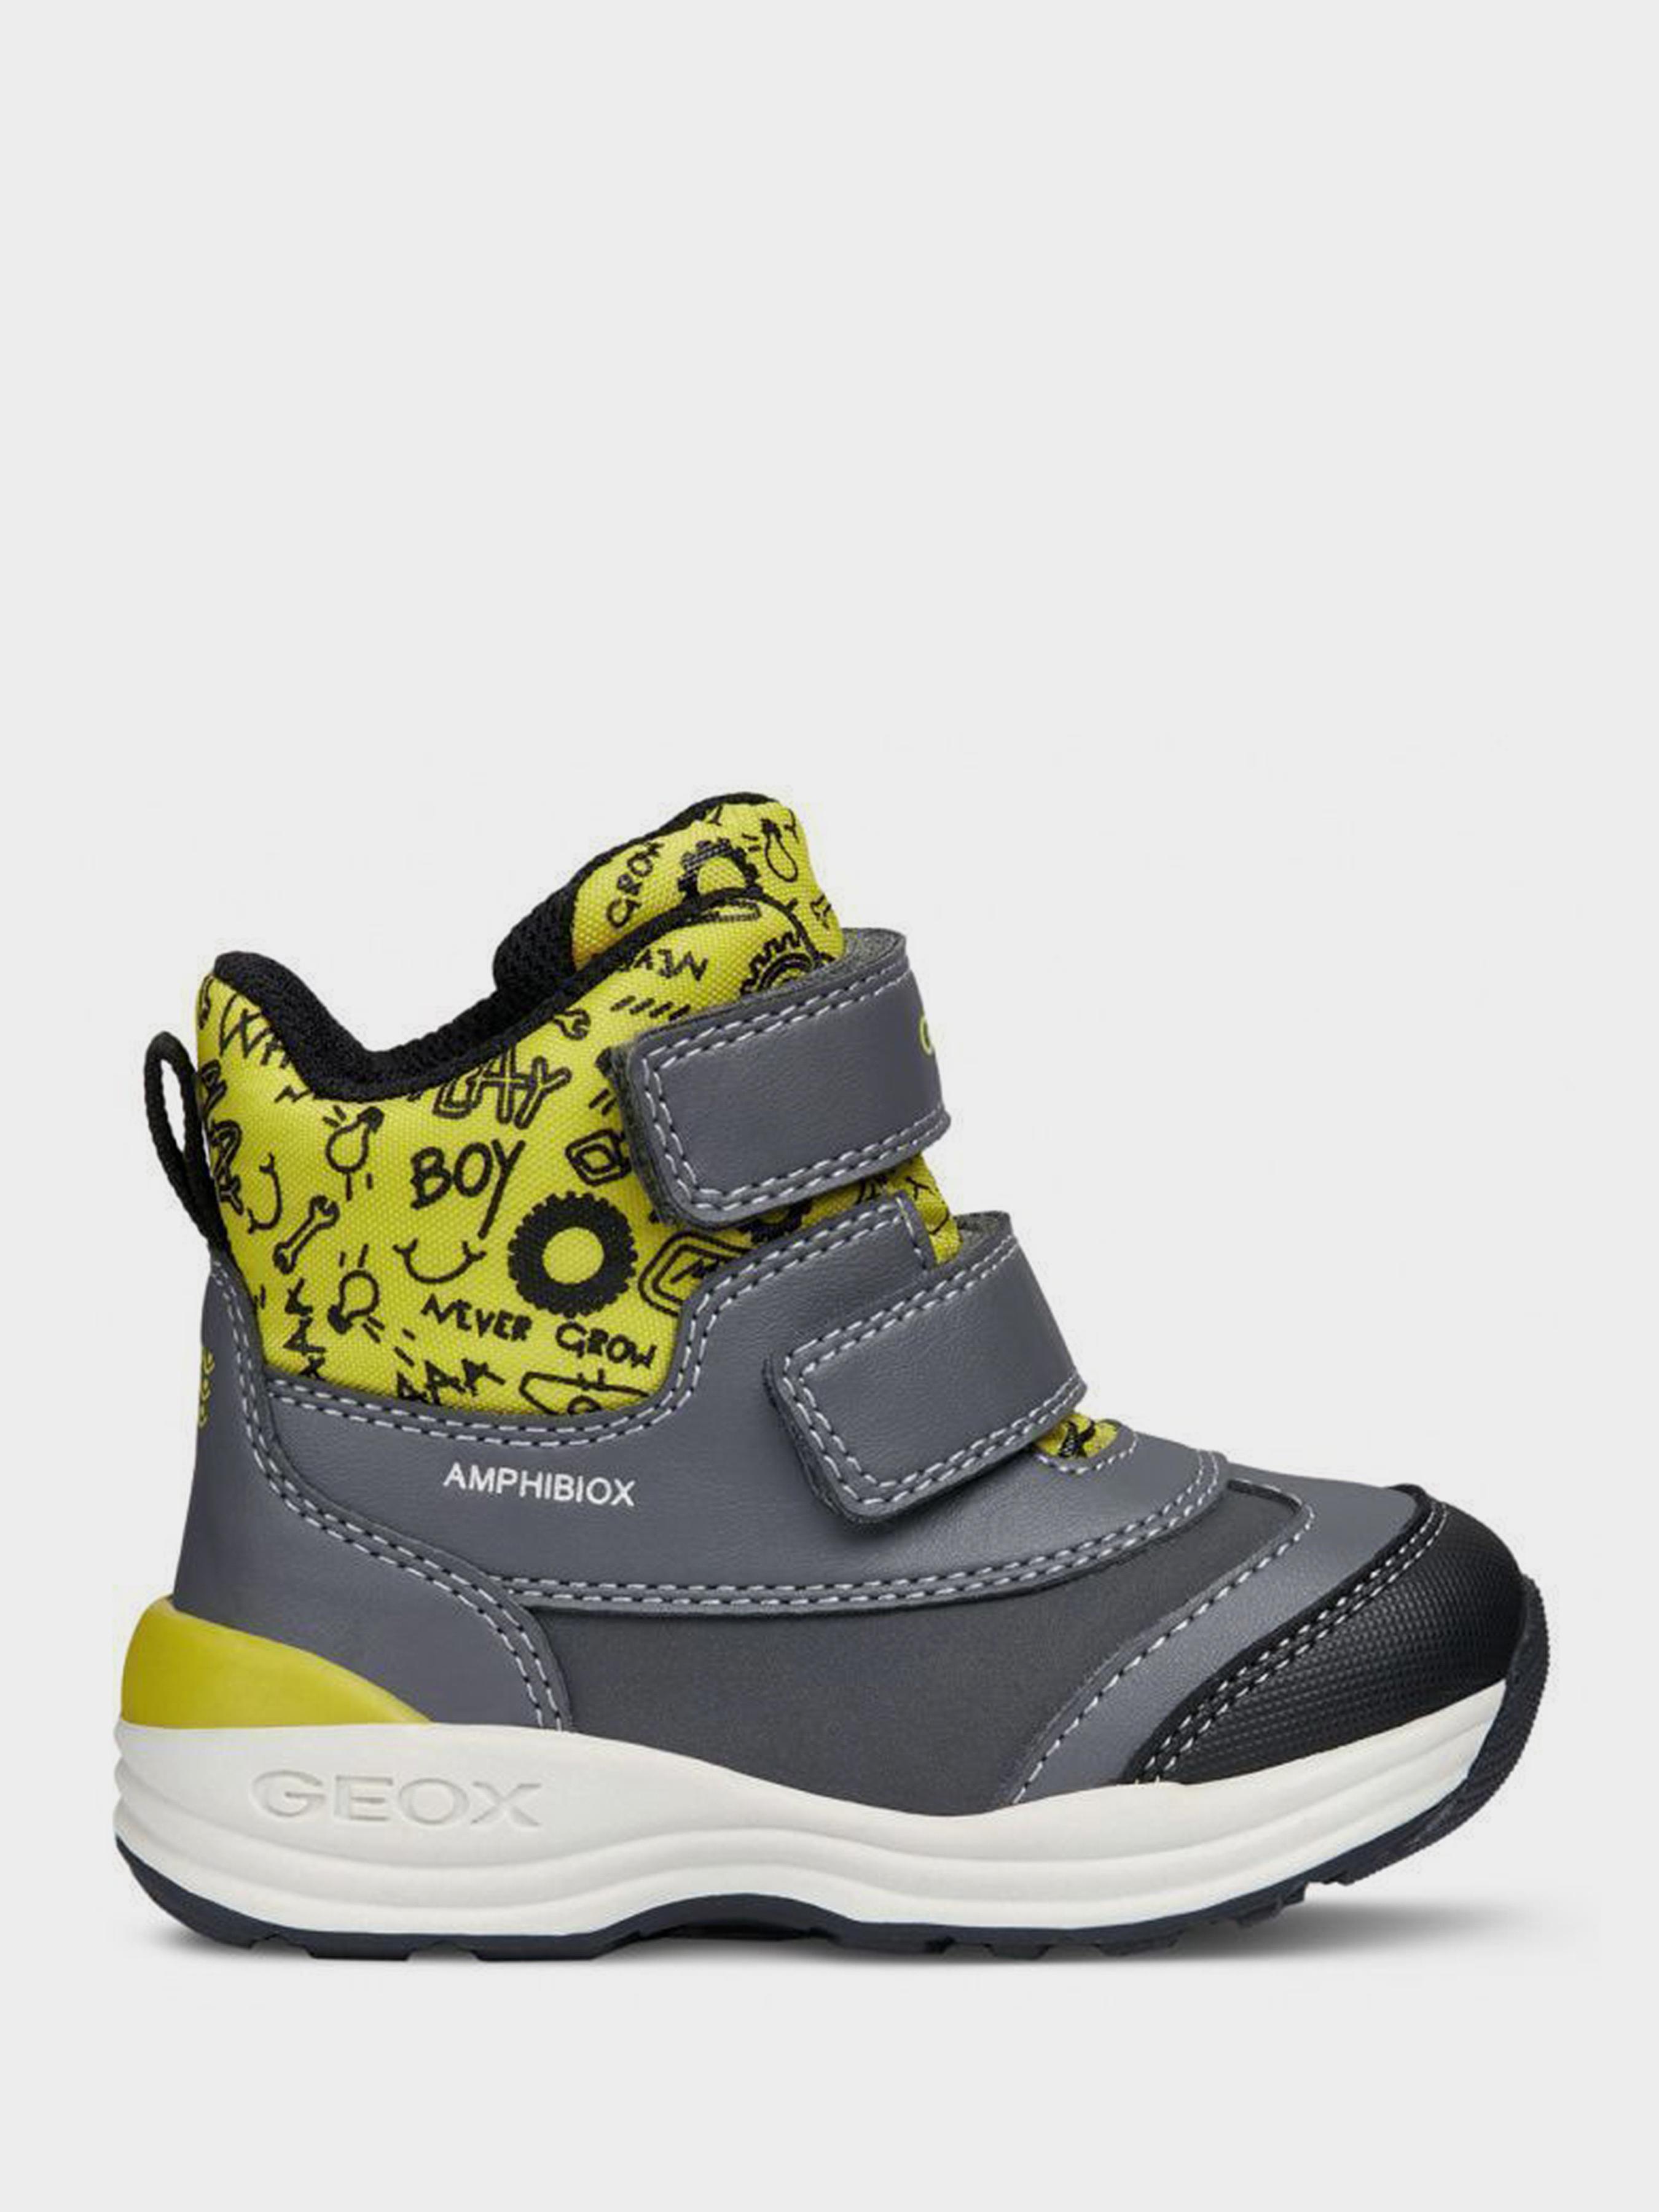 Купить Ботинки детские Geox B NEW GULP BOY B ABX XK5861, Серый